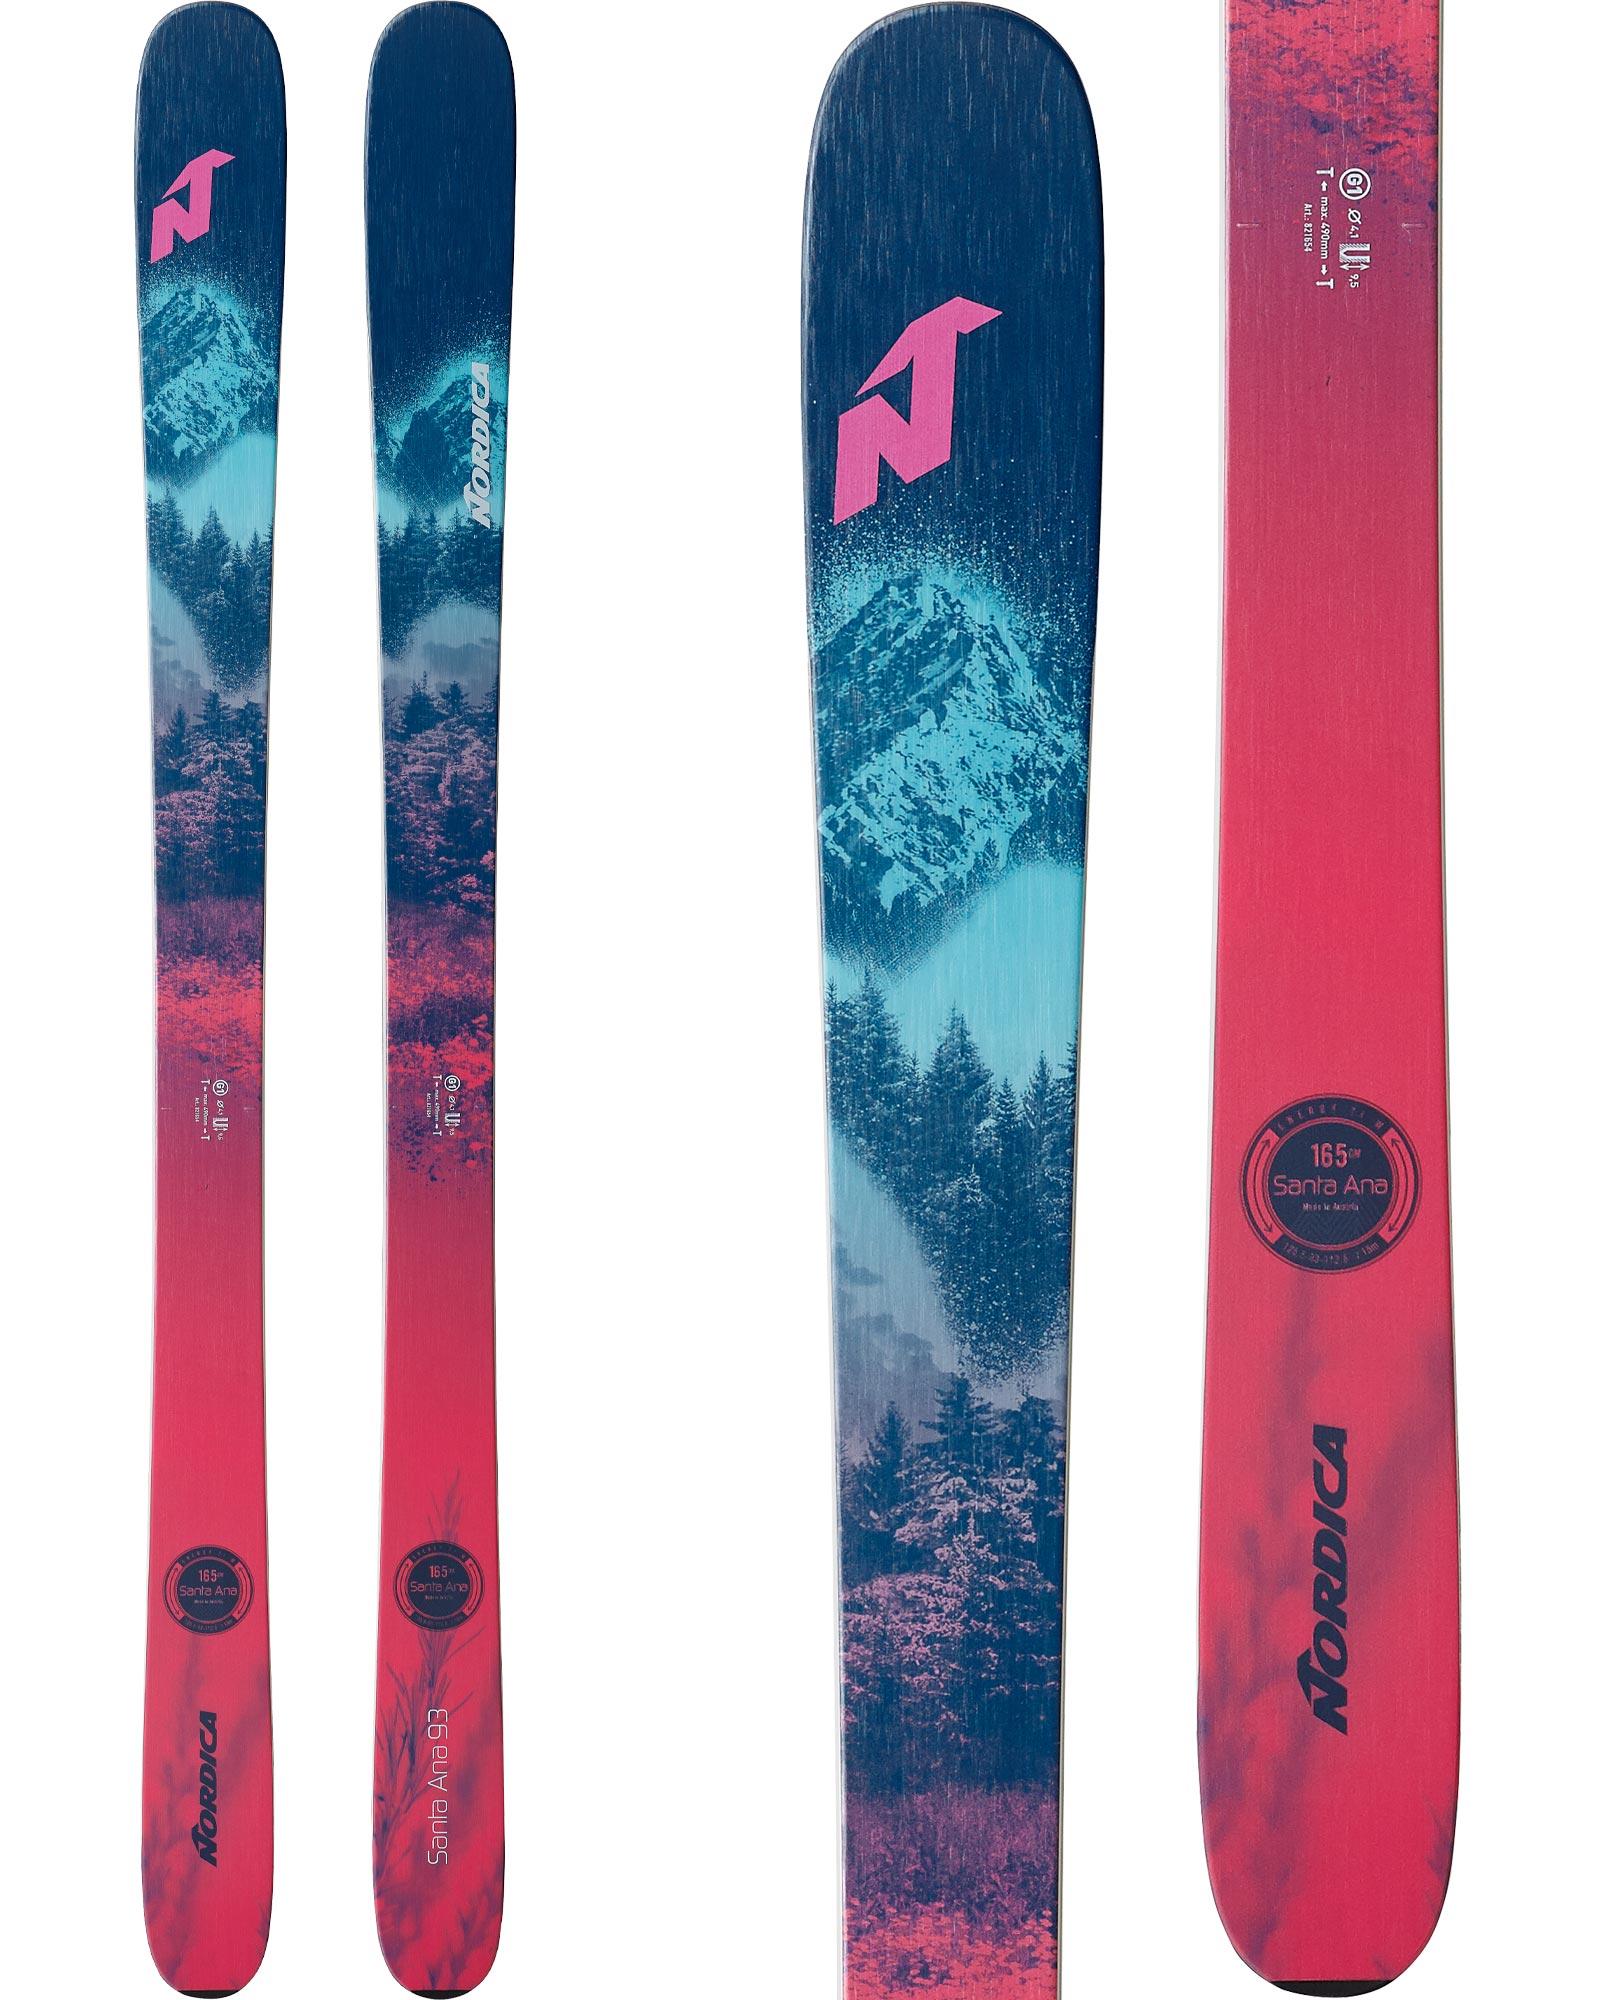 Nordica Women's Santa Ana 93 Freeride Skis 2020 / 2021 0